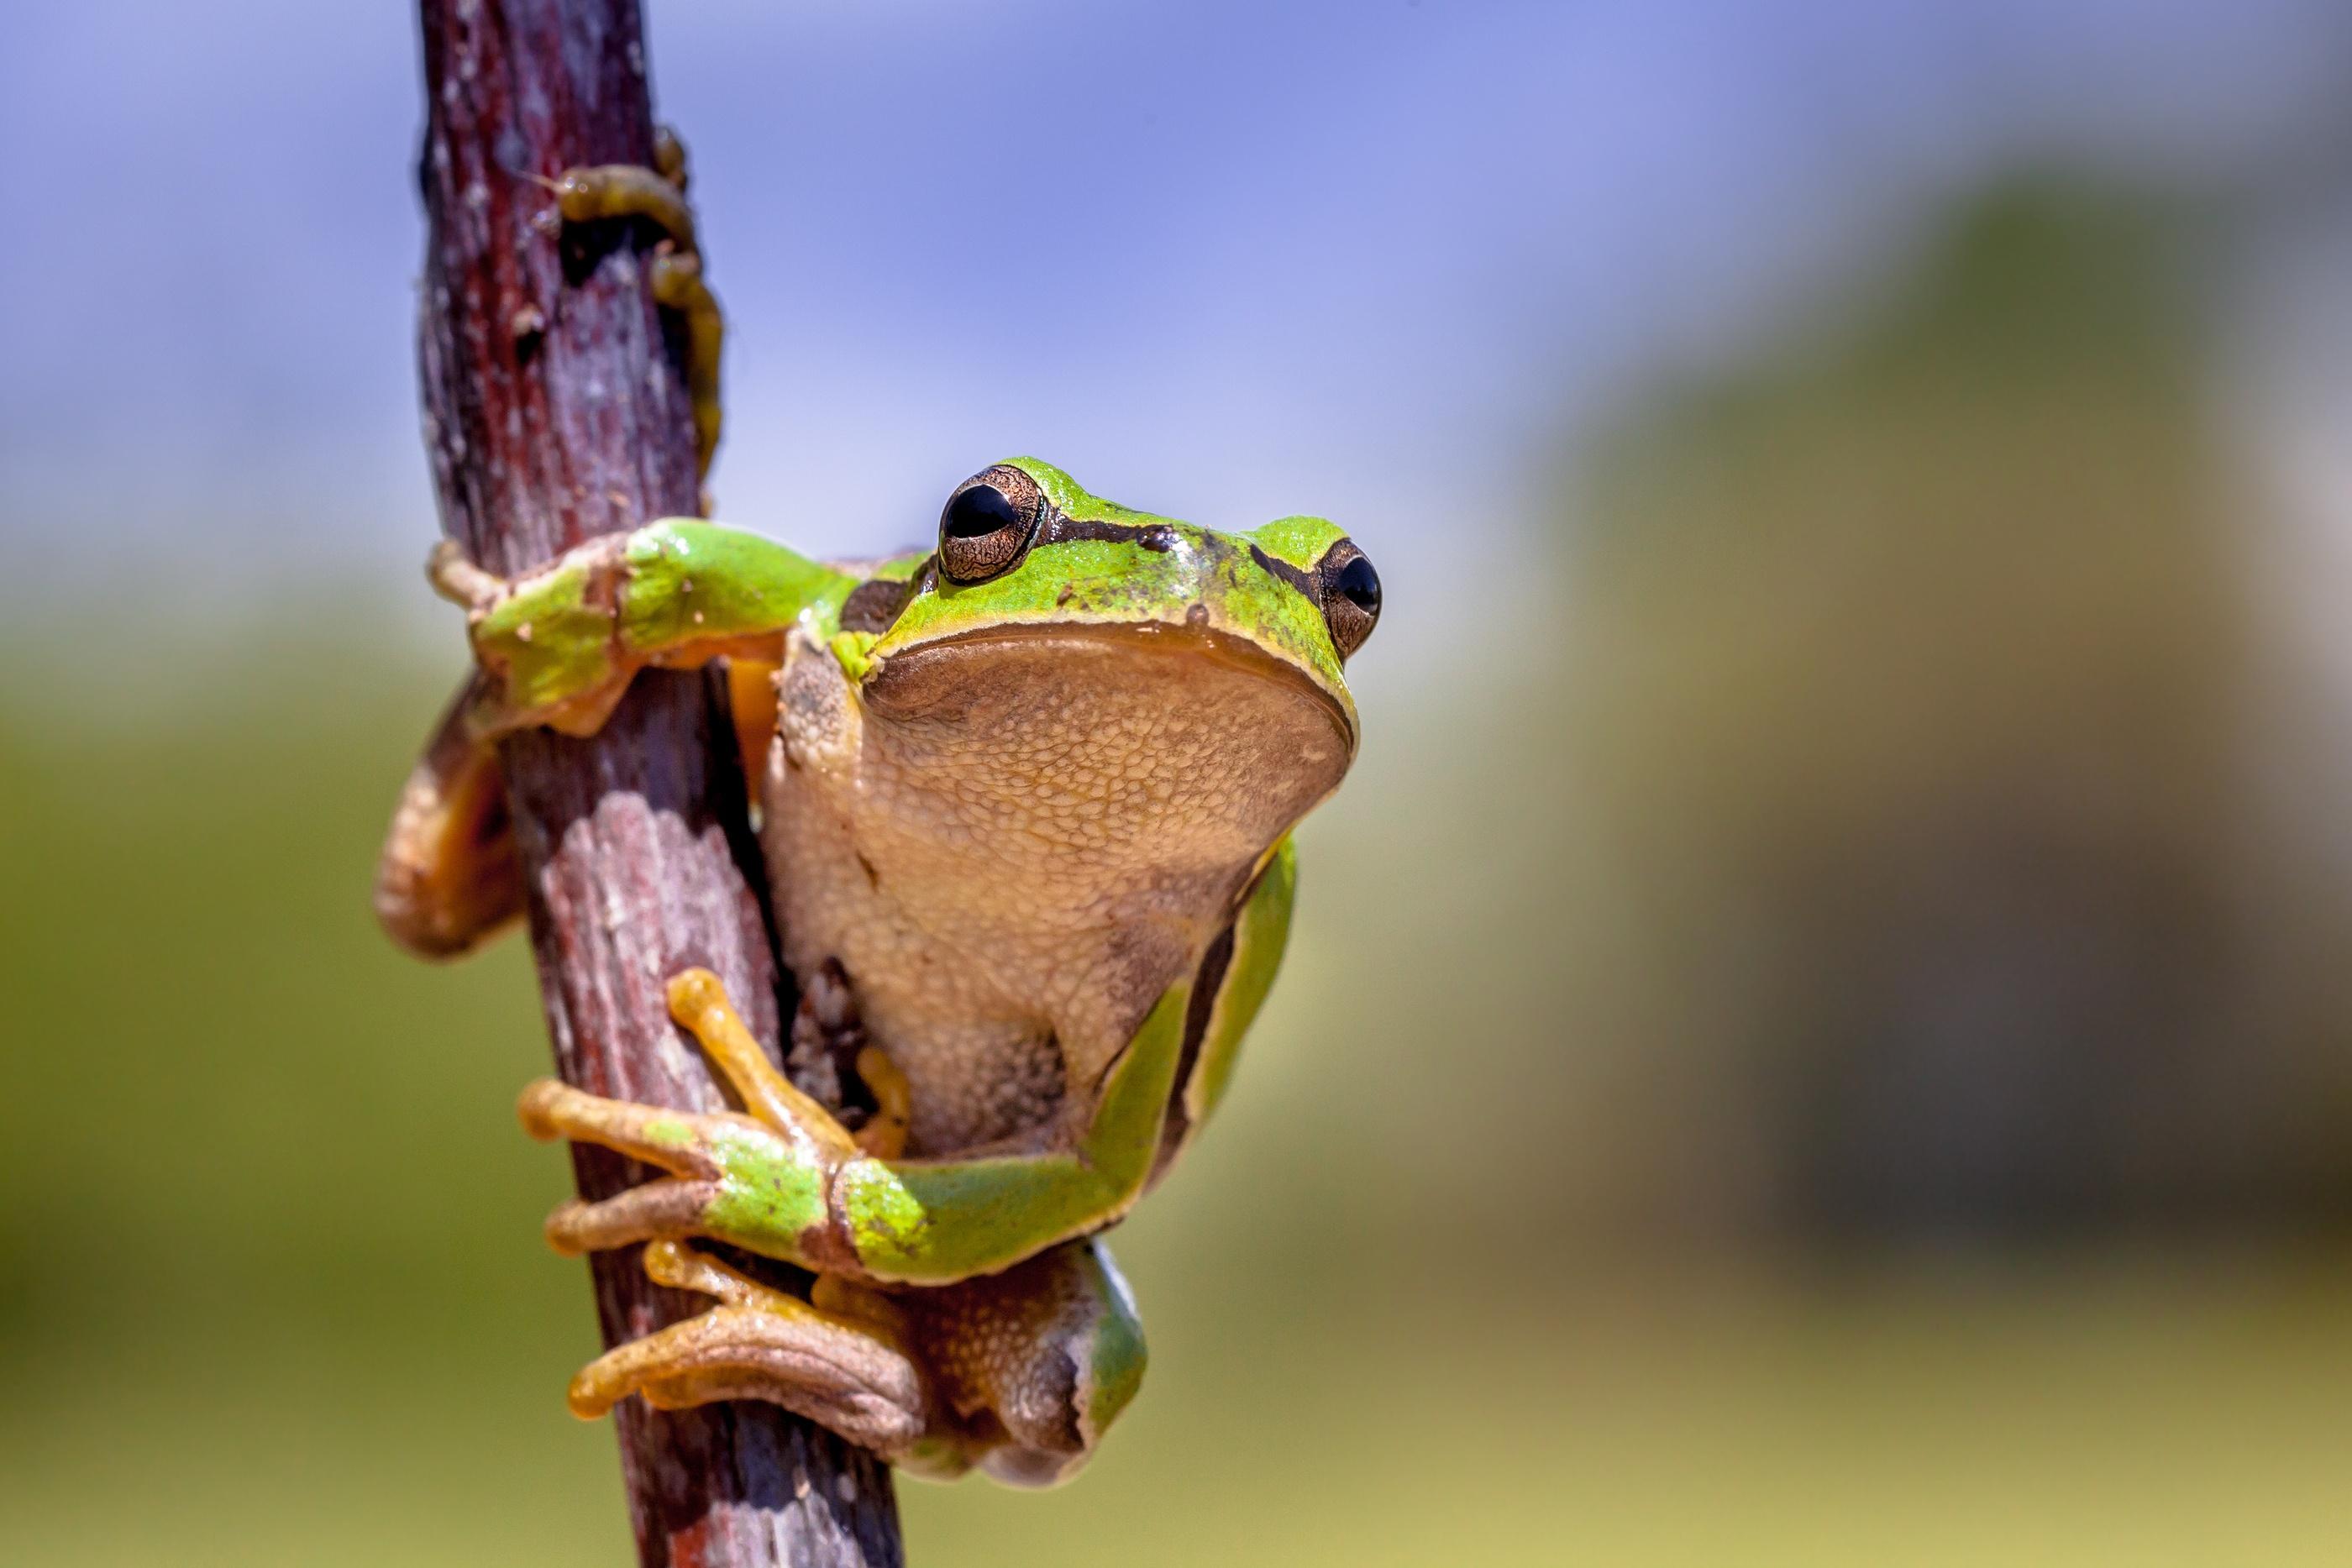 bigstock-Climbing-European-Tree-Frog-145933481